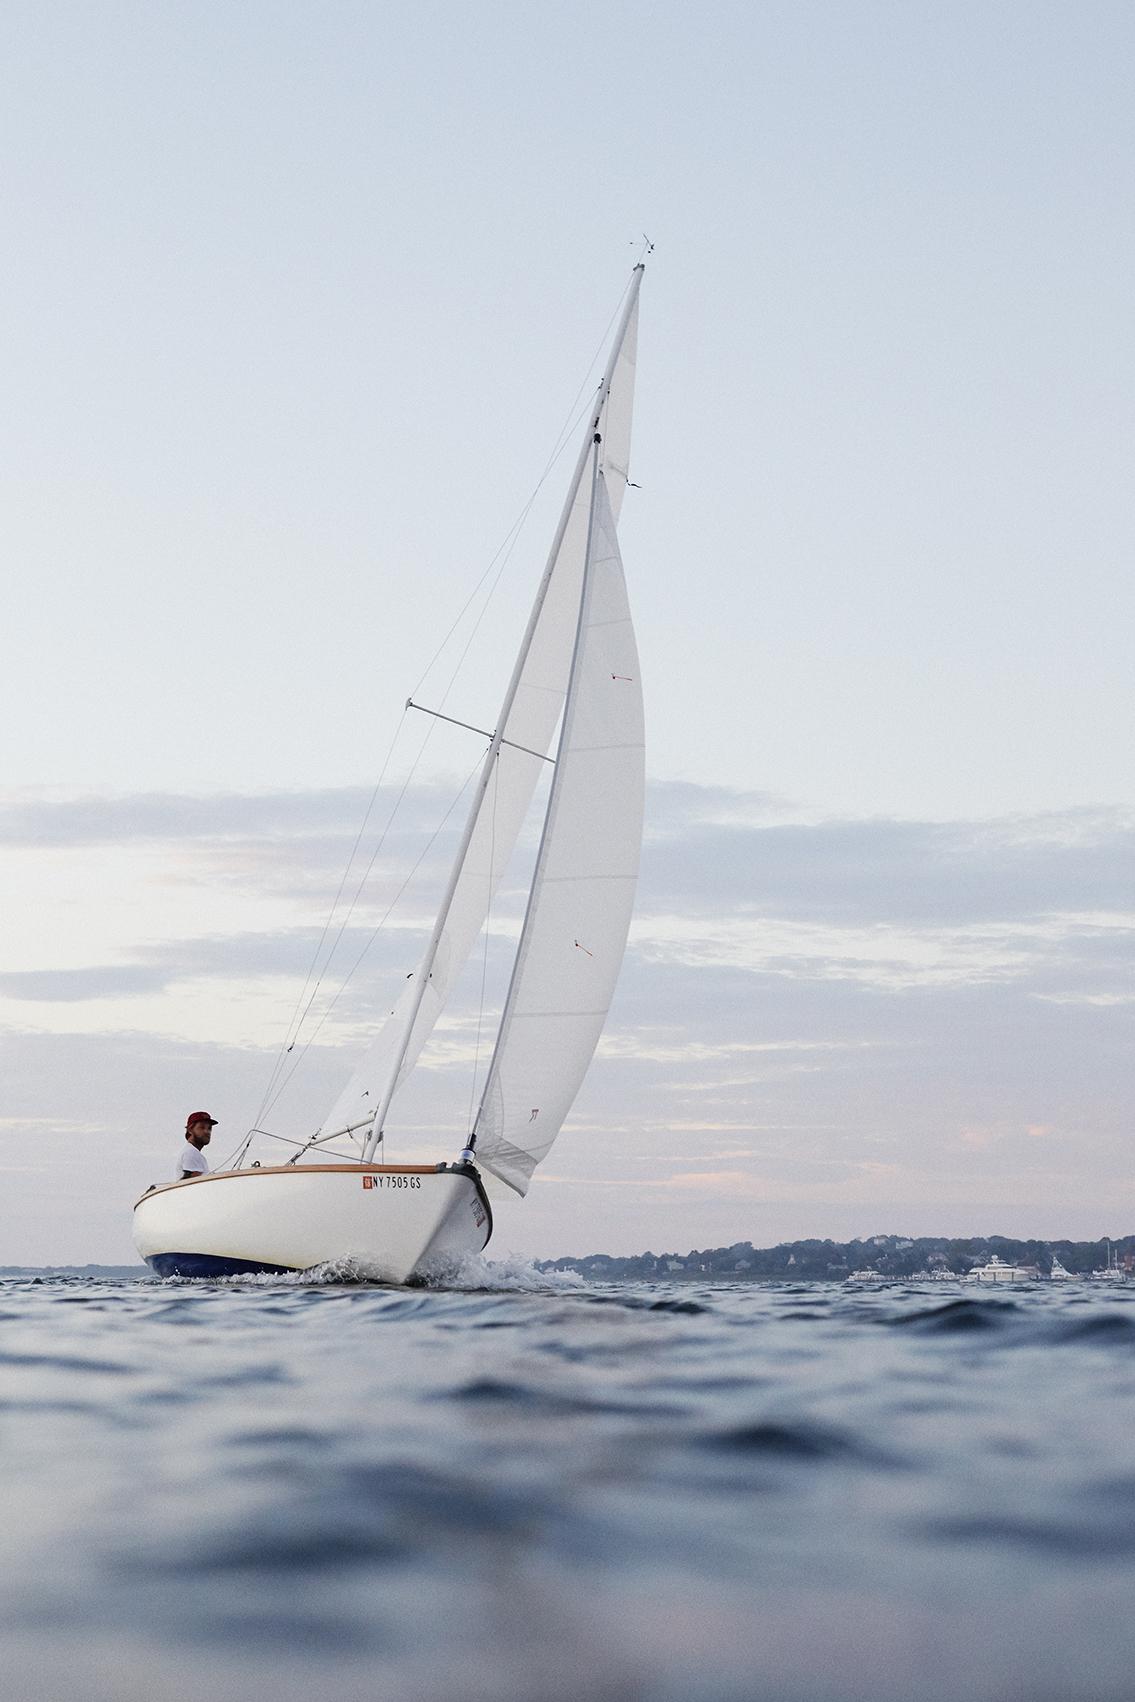 Sail - Mikey DeTemple - Julien Roubinet 1.jpg